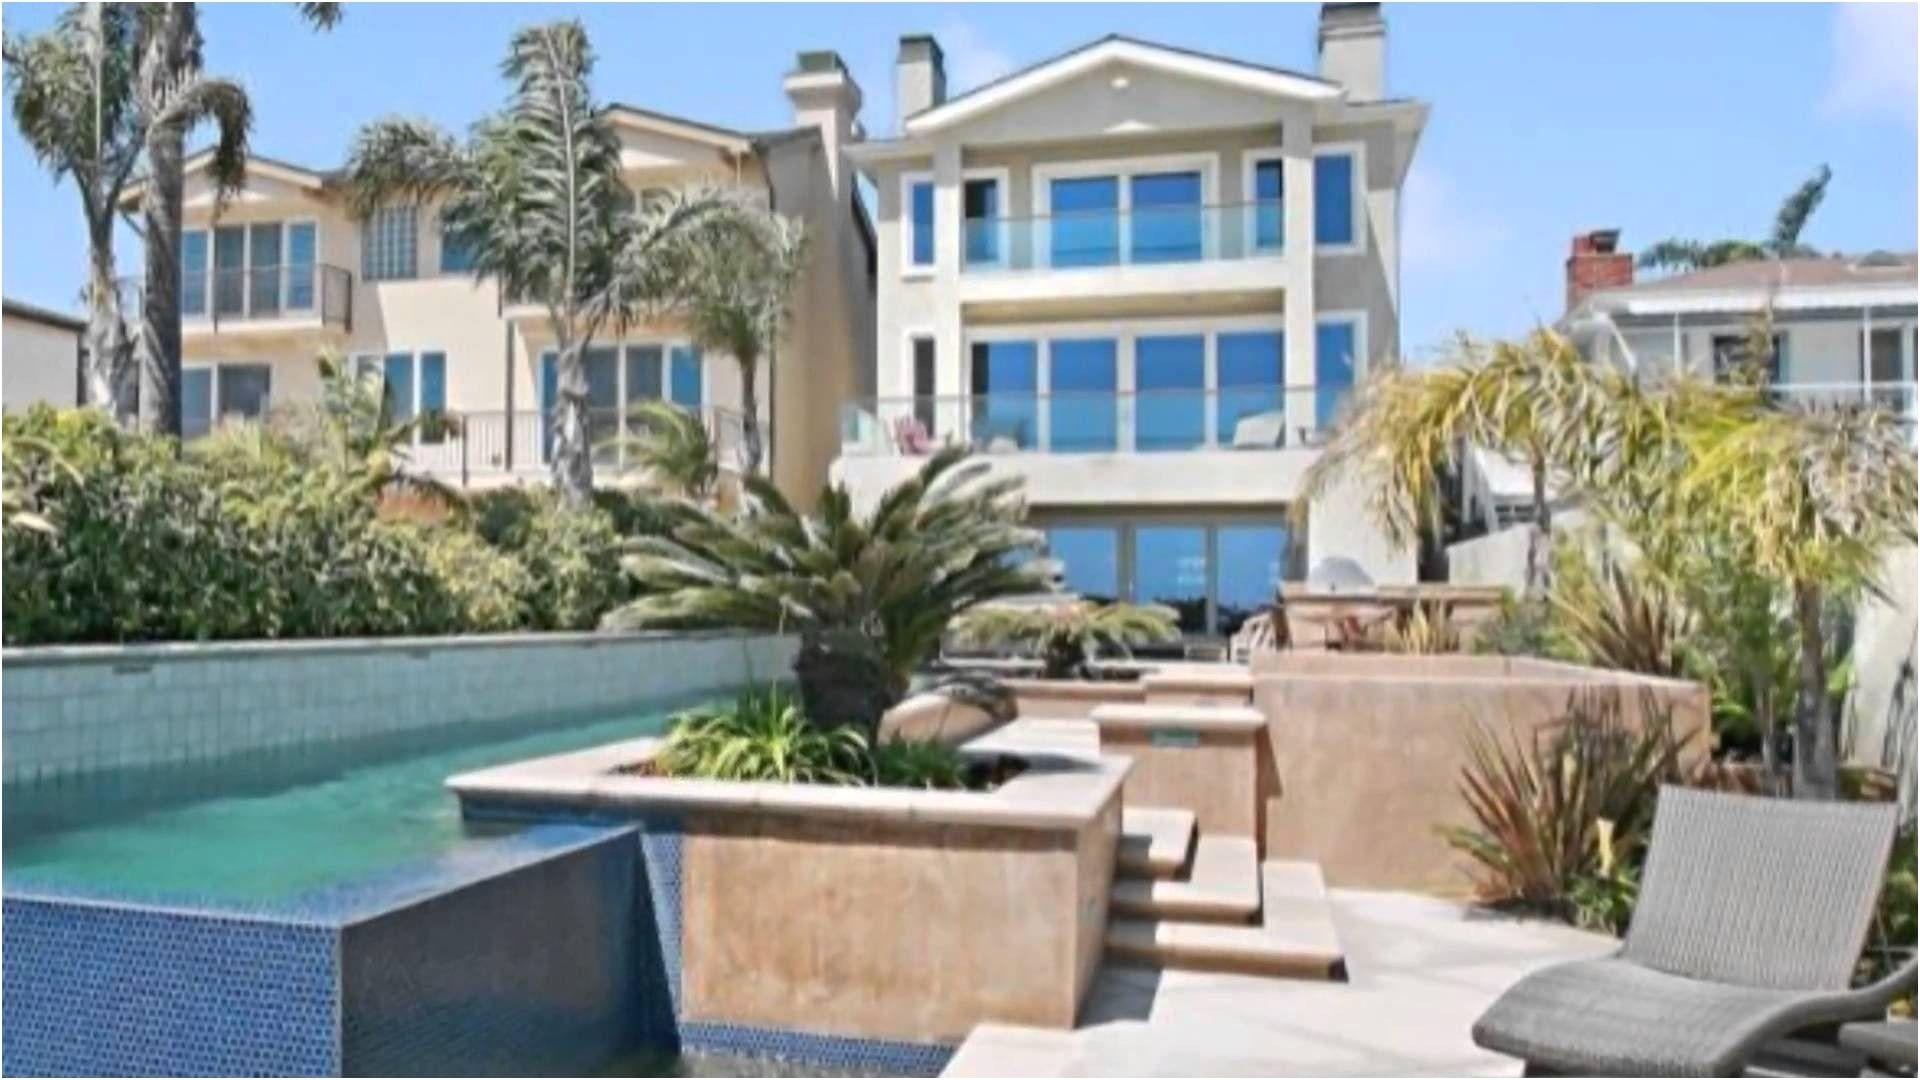 orange county homes for sale 546 ocean ave seal beach ca 2 youtube from huntington beach